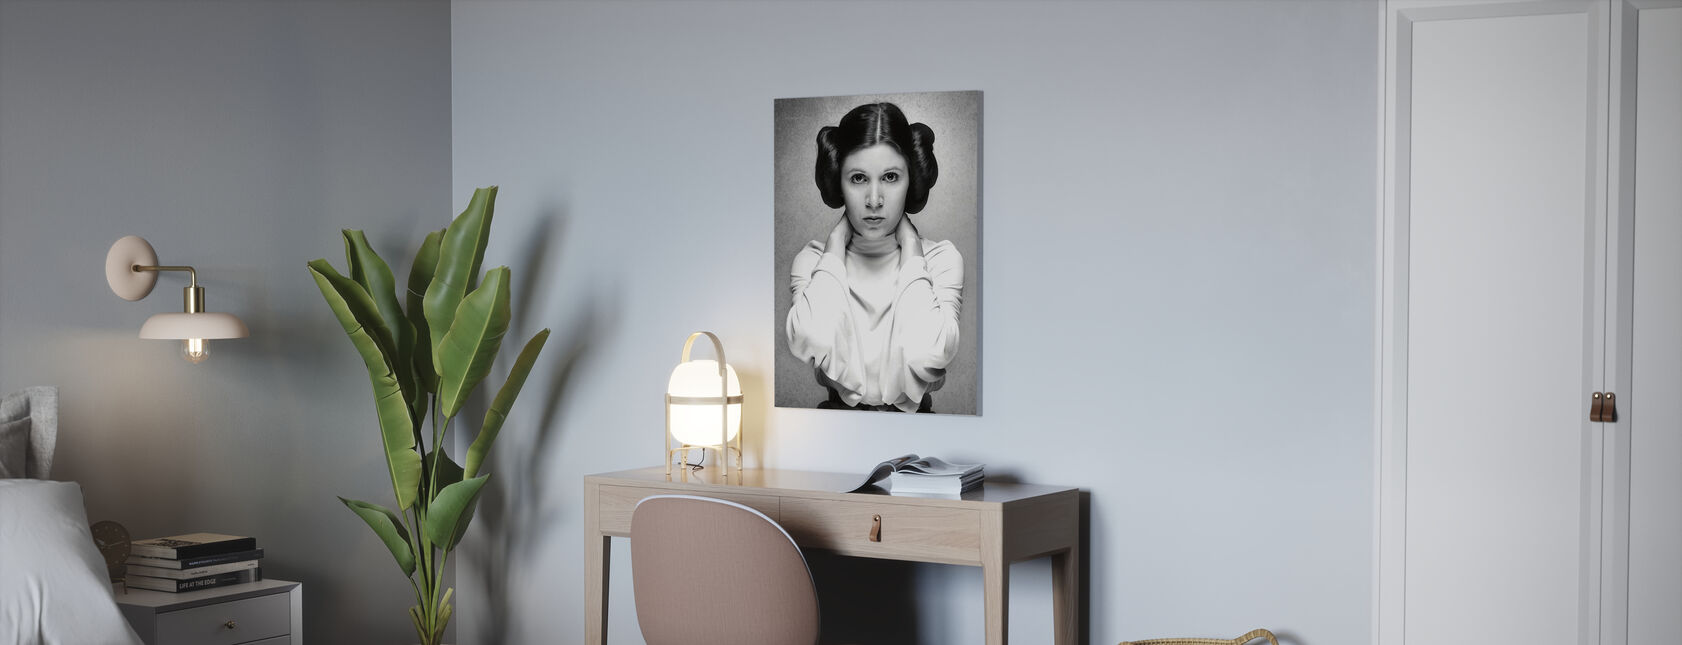 Prinzessin Leia - Carrie Fisher - Leinwandbild - Büro